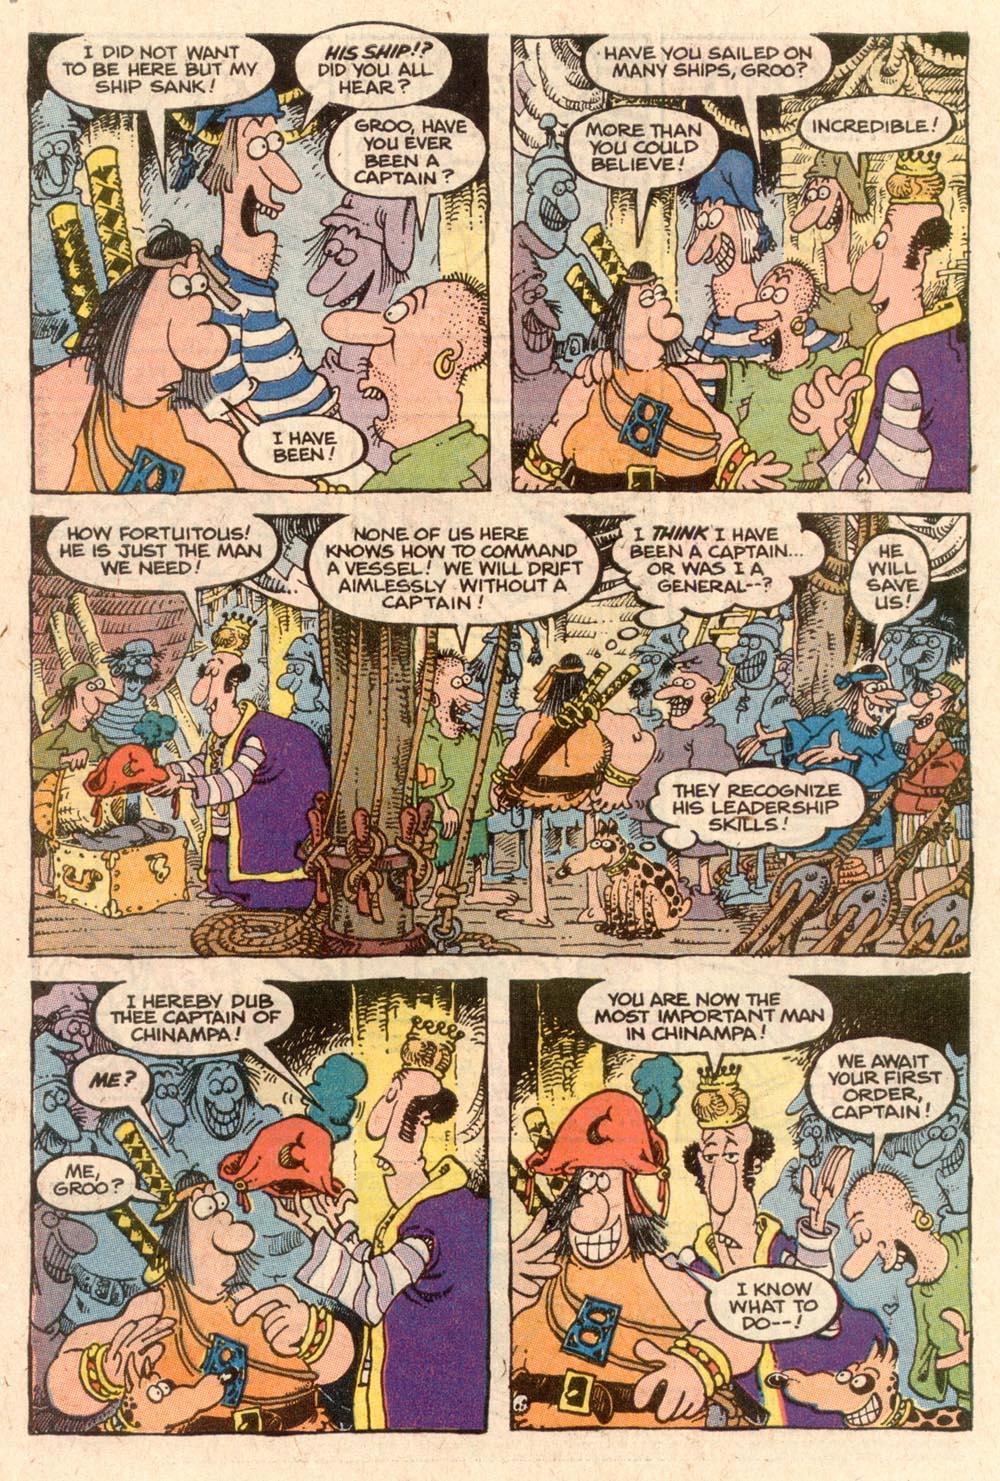 Read online Sergio Aragonés Groo the Wanderer comic -  Issue #57 - 6